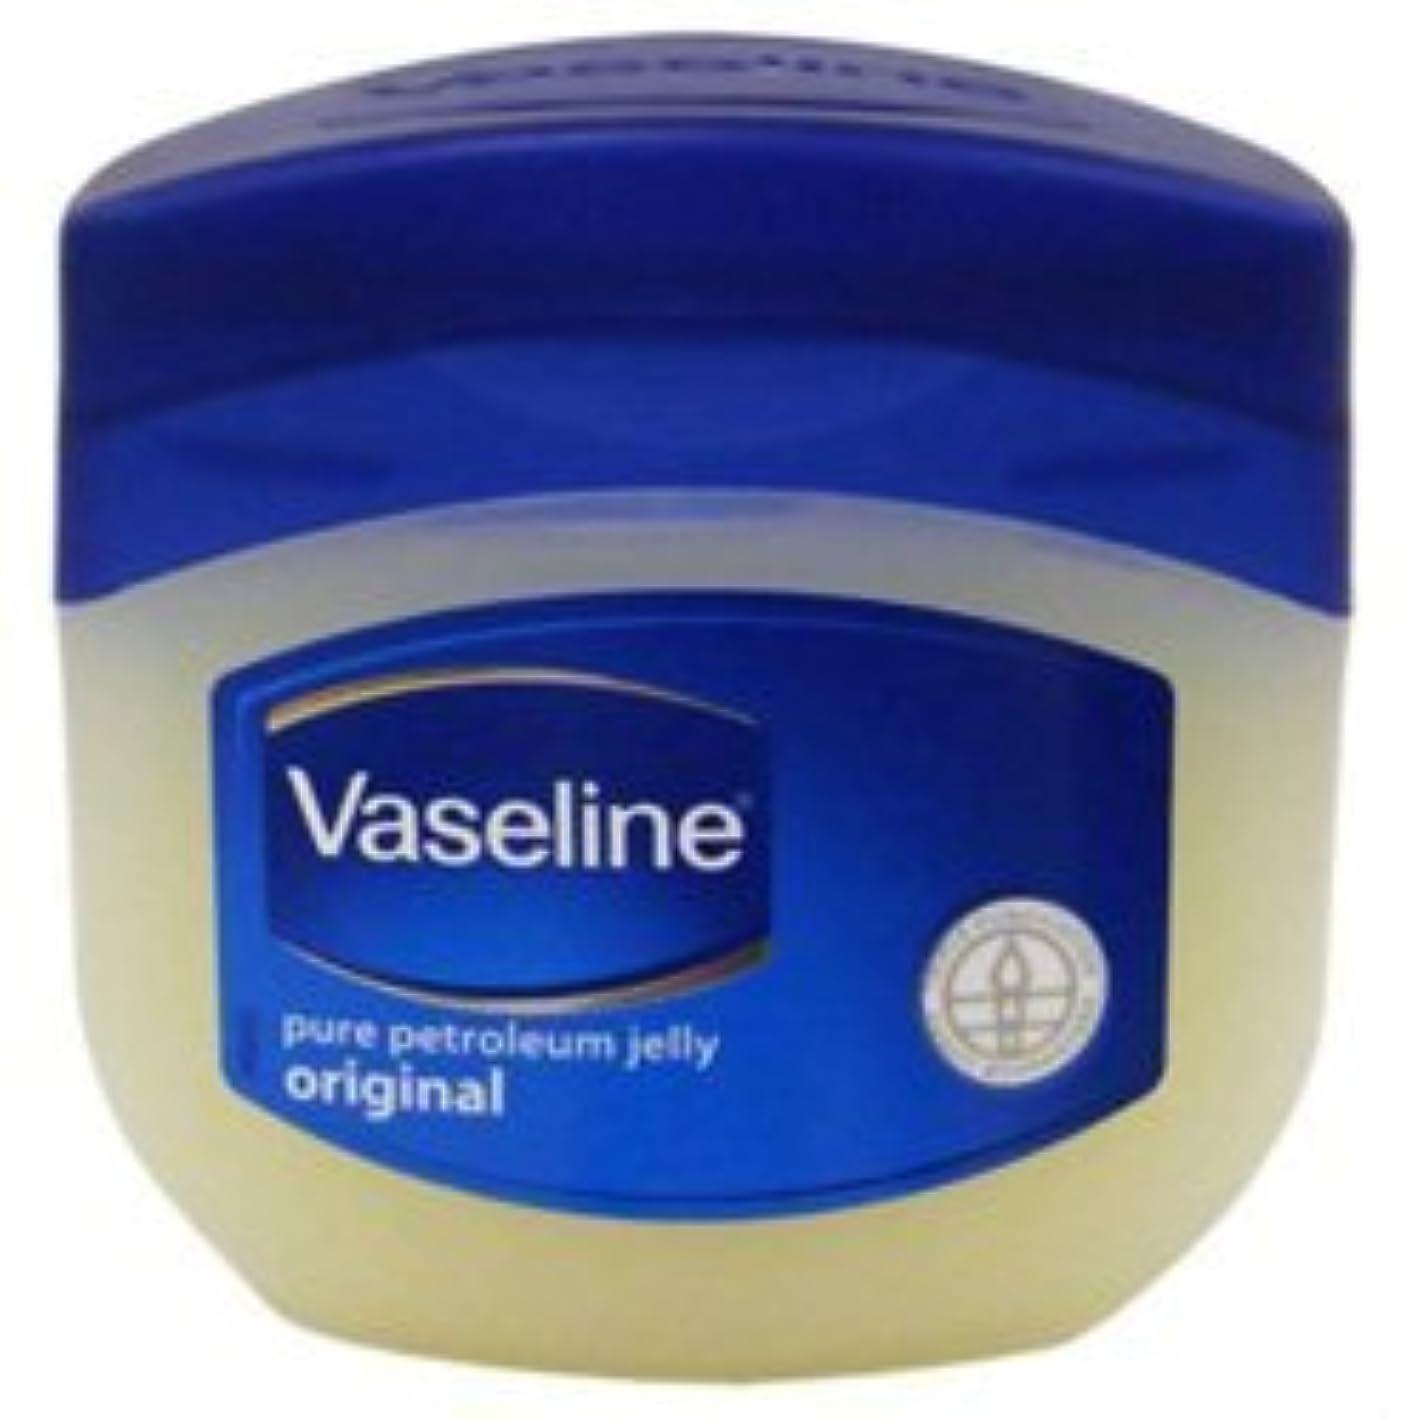 【Vaseline】ヴァセリン ピュアスキンジェリー (スキンオイル) 80g ×20個セット